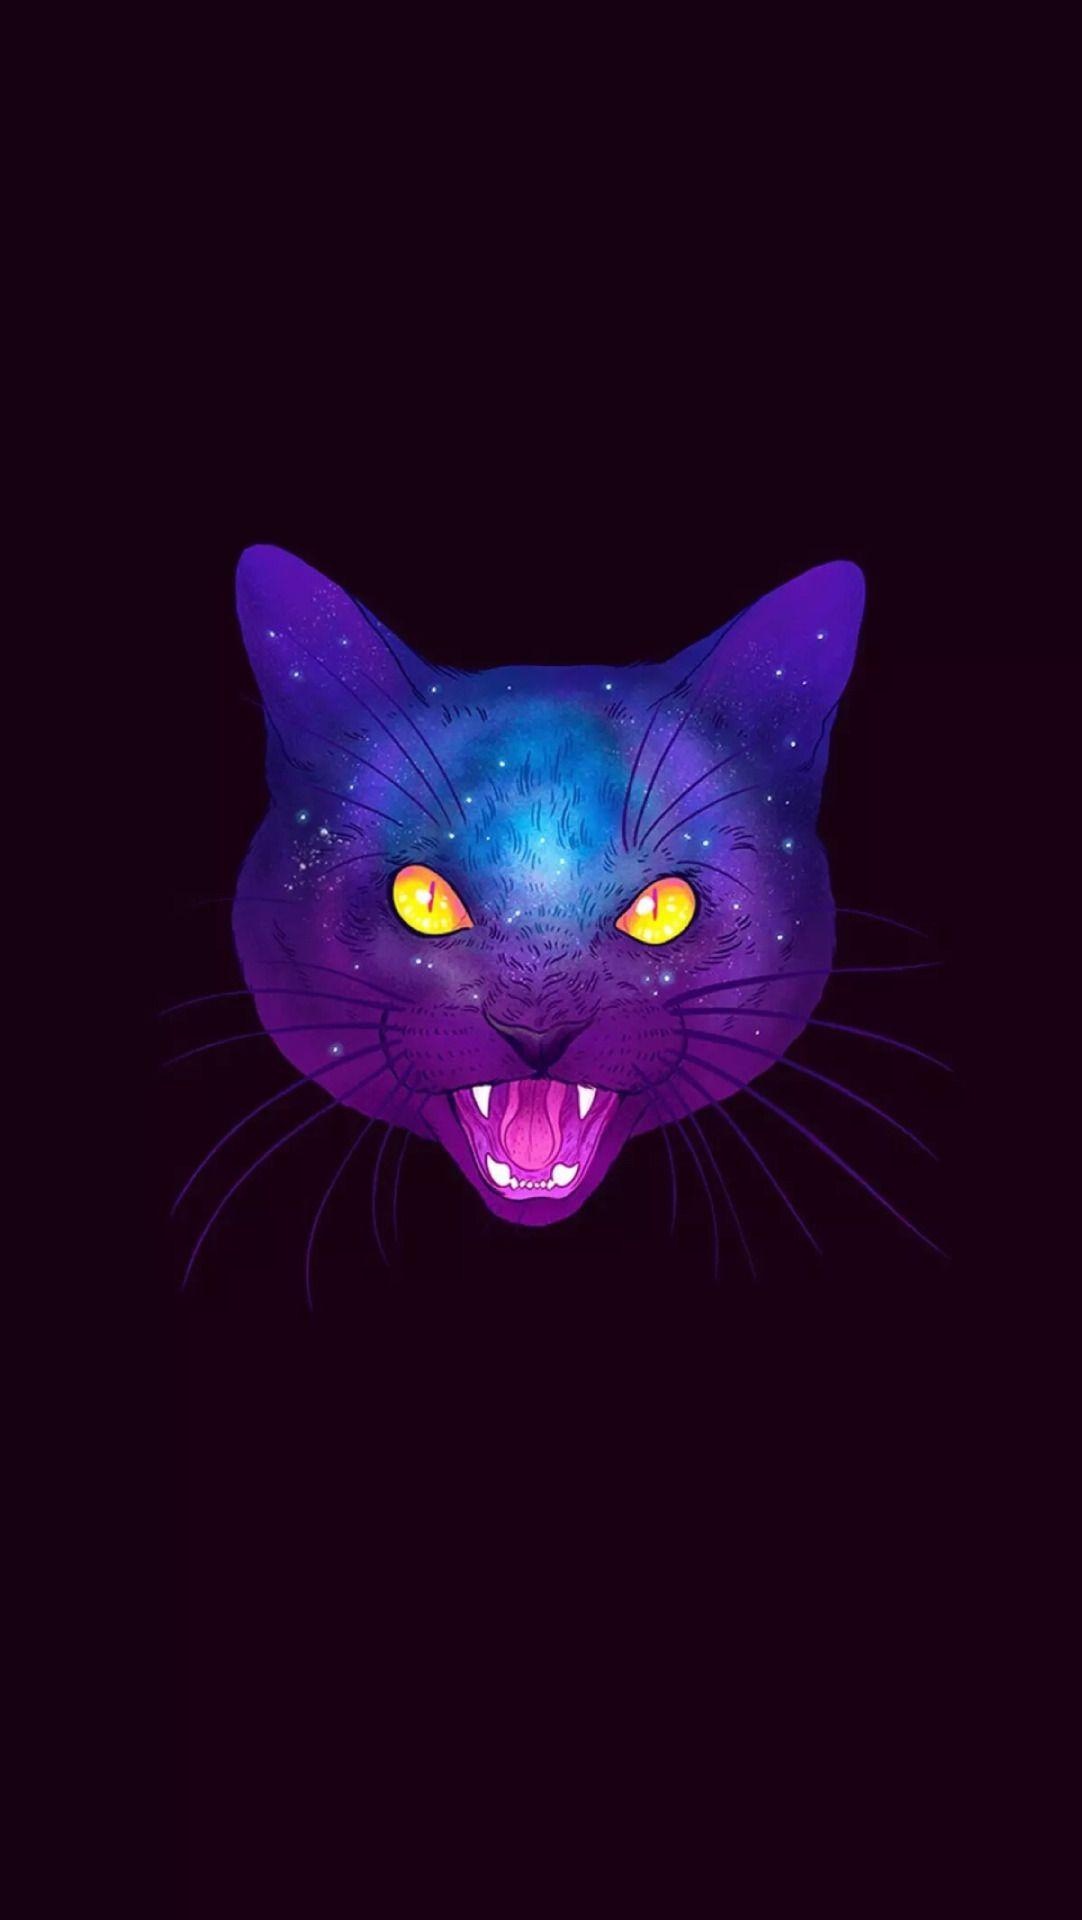 Iphone Wallpapers Trippy Cat Cat Painting Cat Design Art